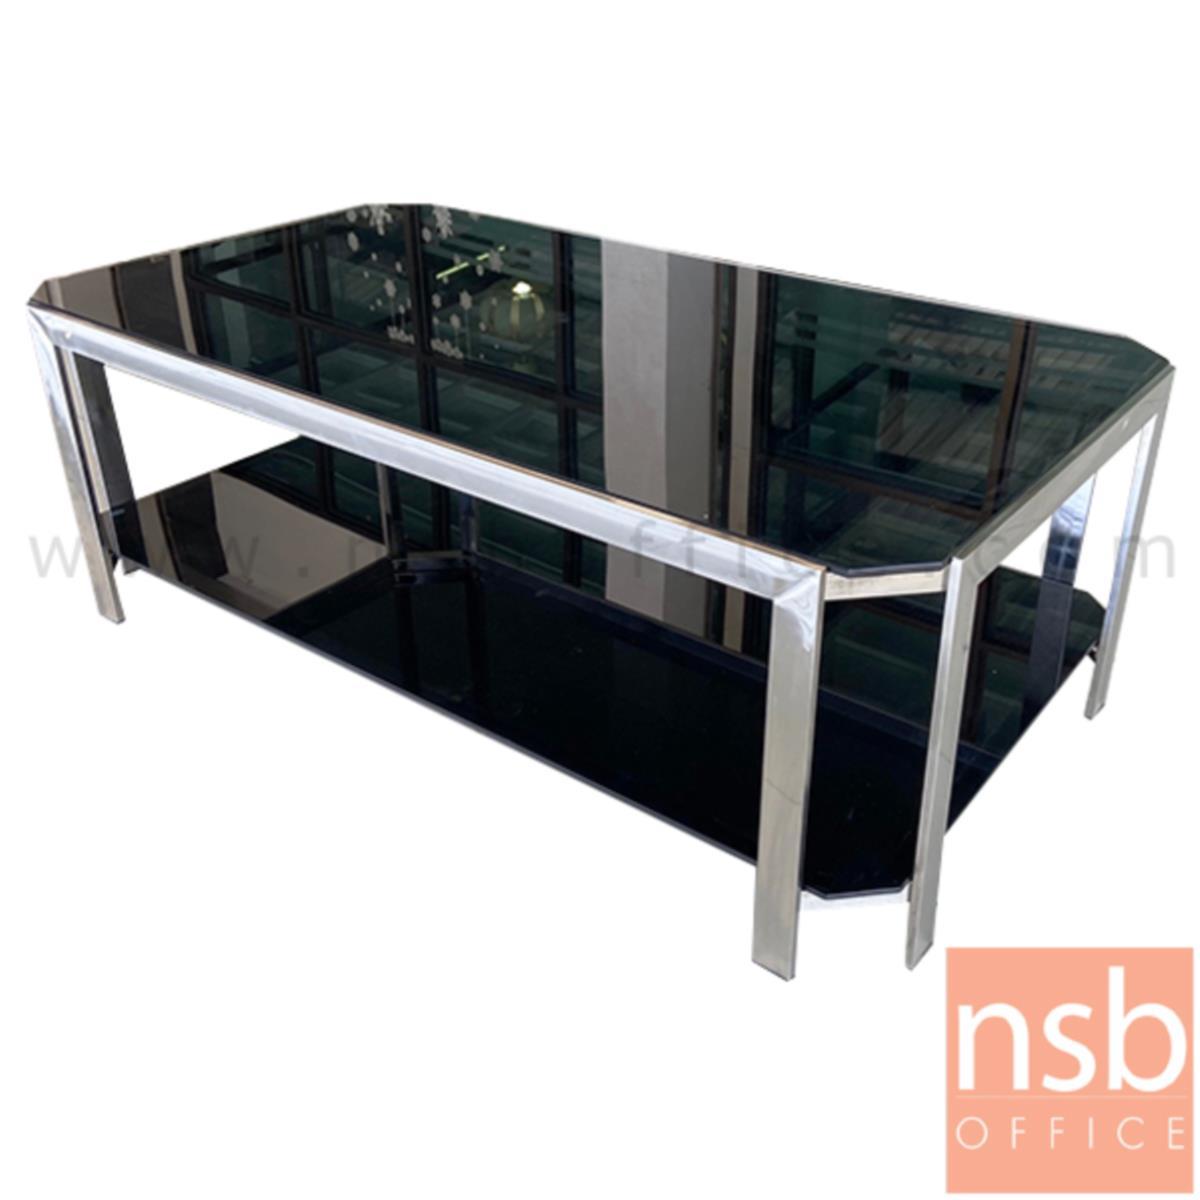 B13A269:โต๊ะกลาง รุ่น Daisy (เดซี) ท็อปกระจก